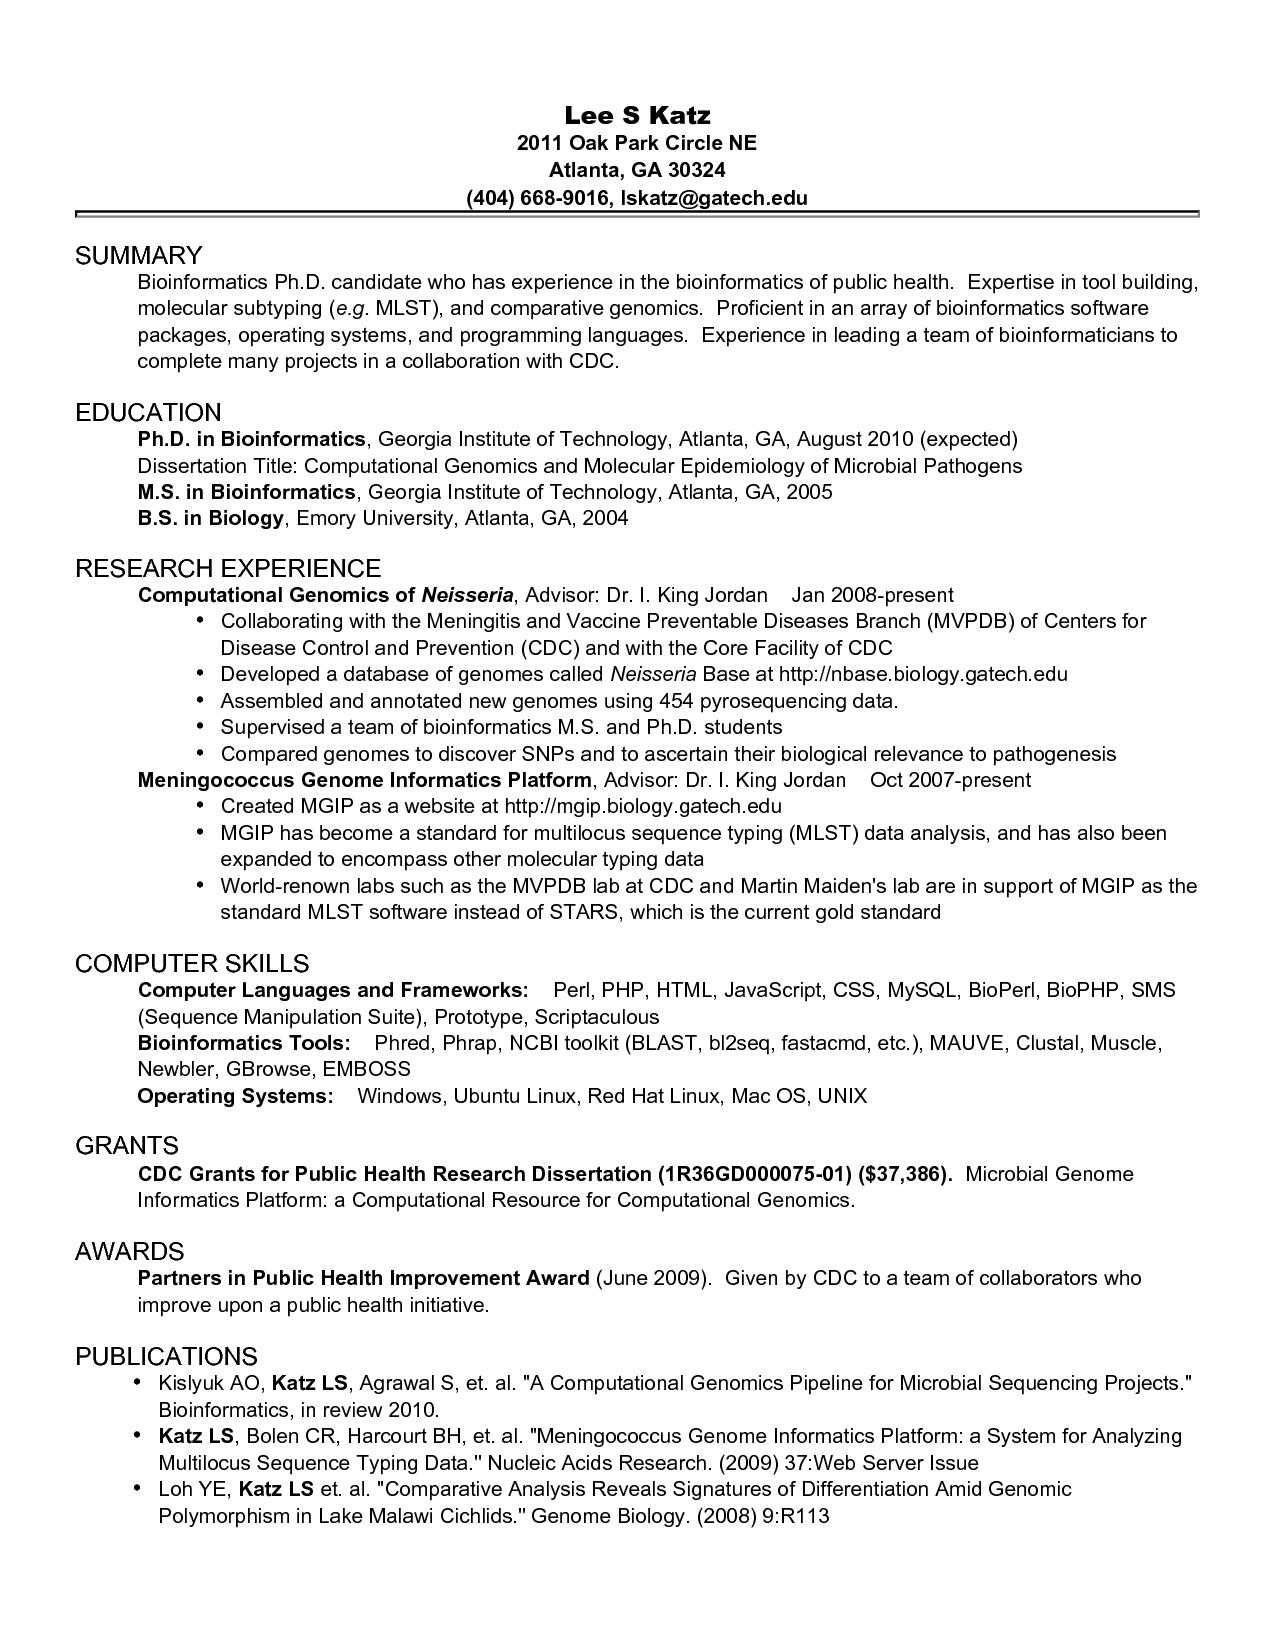 12 ALL NEW CV TEMPLATE PHD  Academic cv, Job resume examples